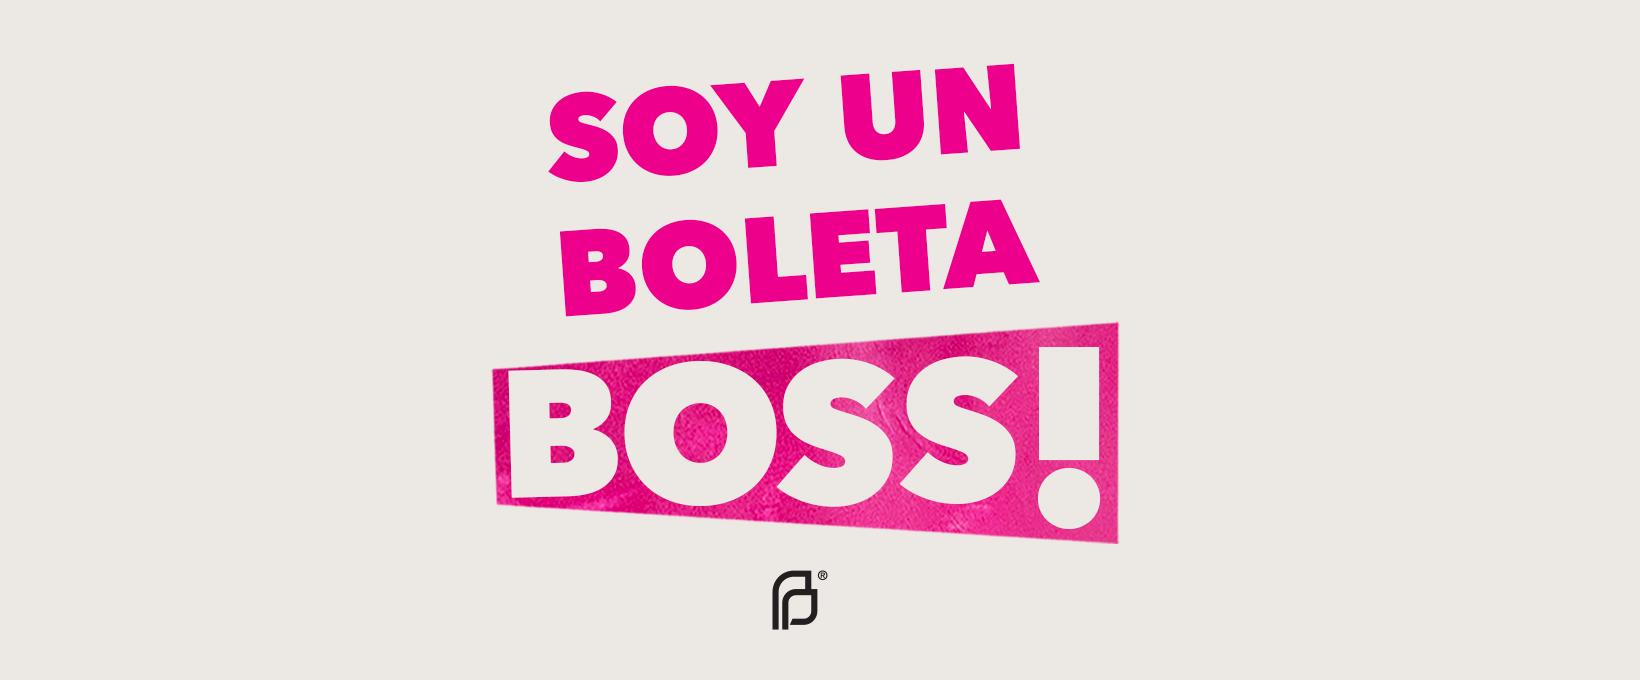 Soy Un Boleta Boss